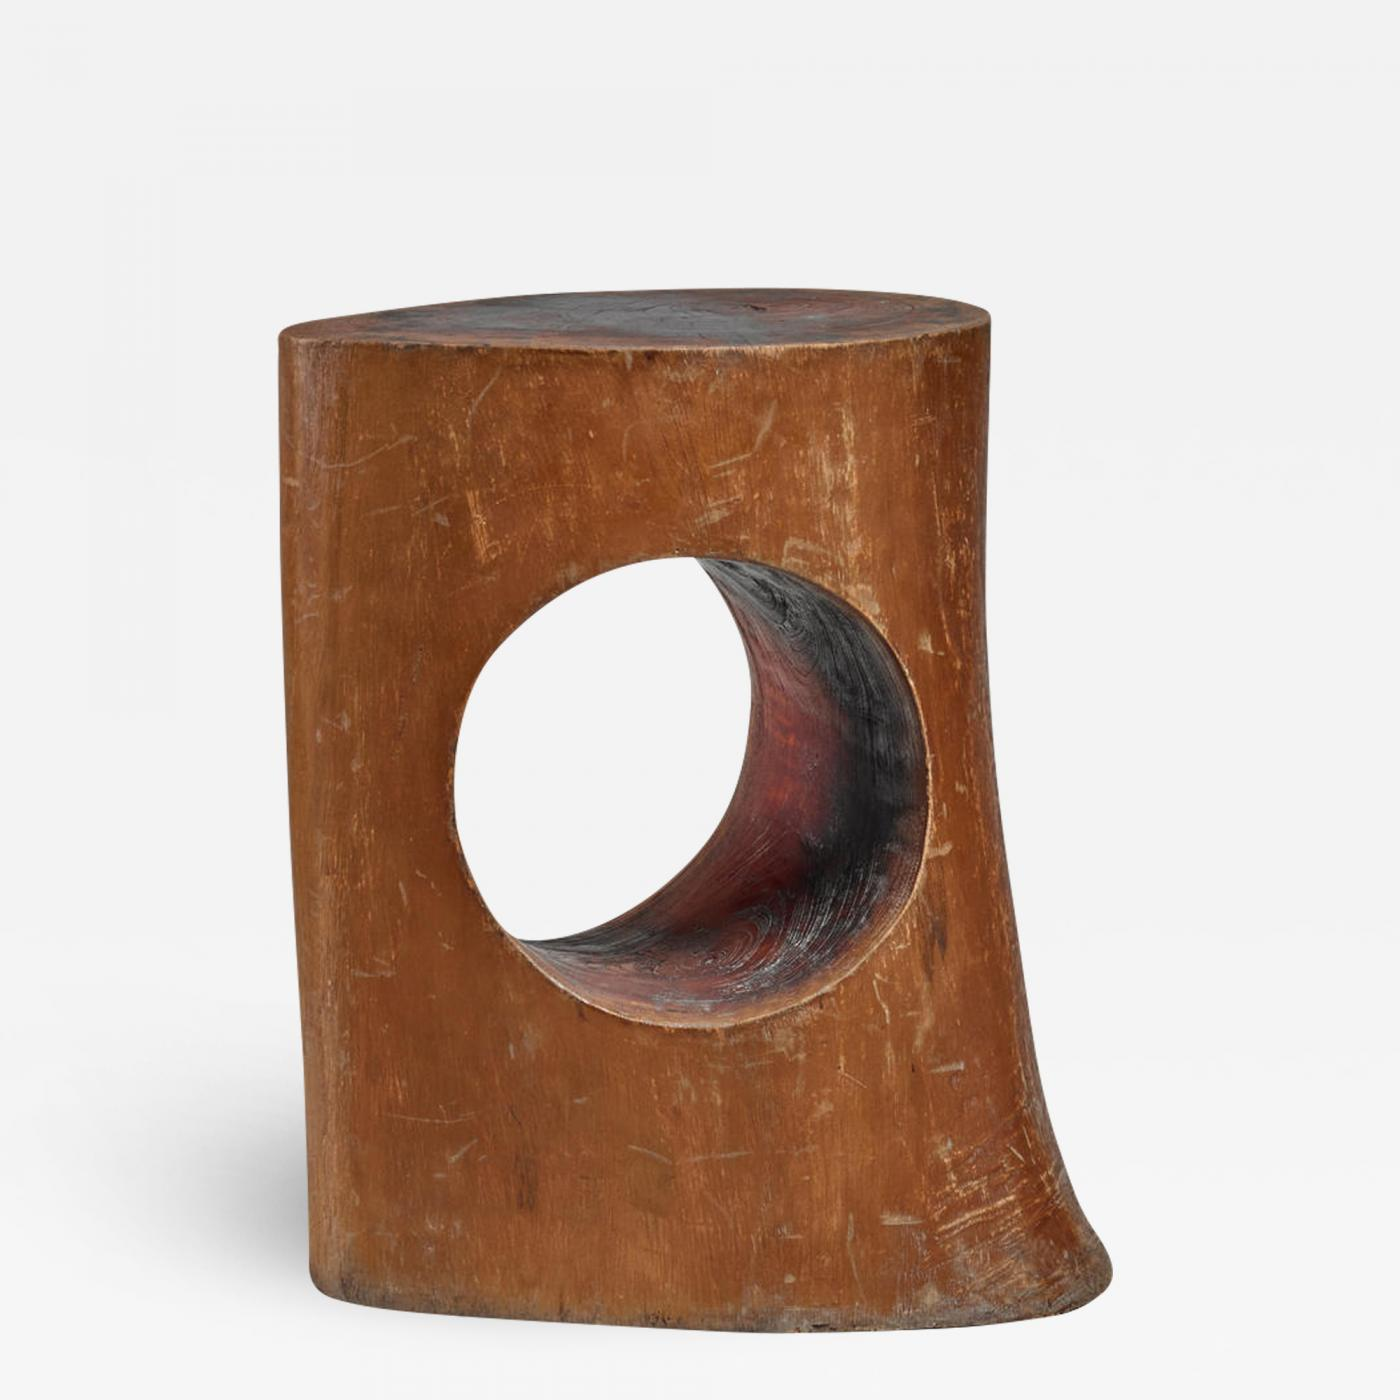 Wondrous Jose Zanine Caldas Zanine Caldas Wooden Craft Stool Or Pabps2019 Chair Design Images Pabps2019Com